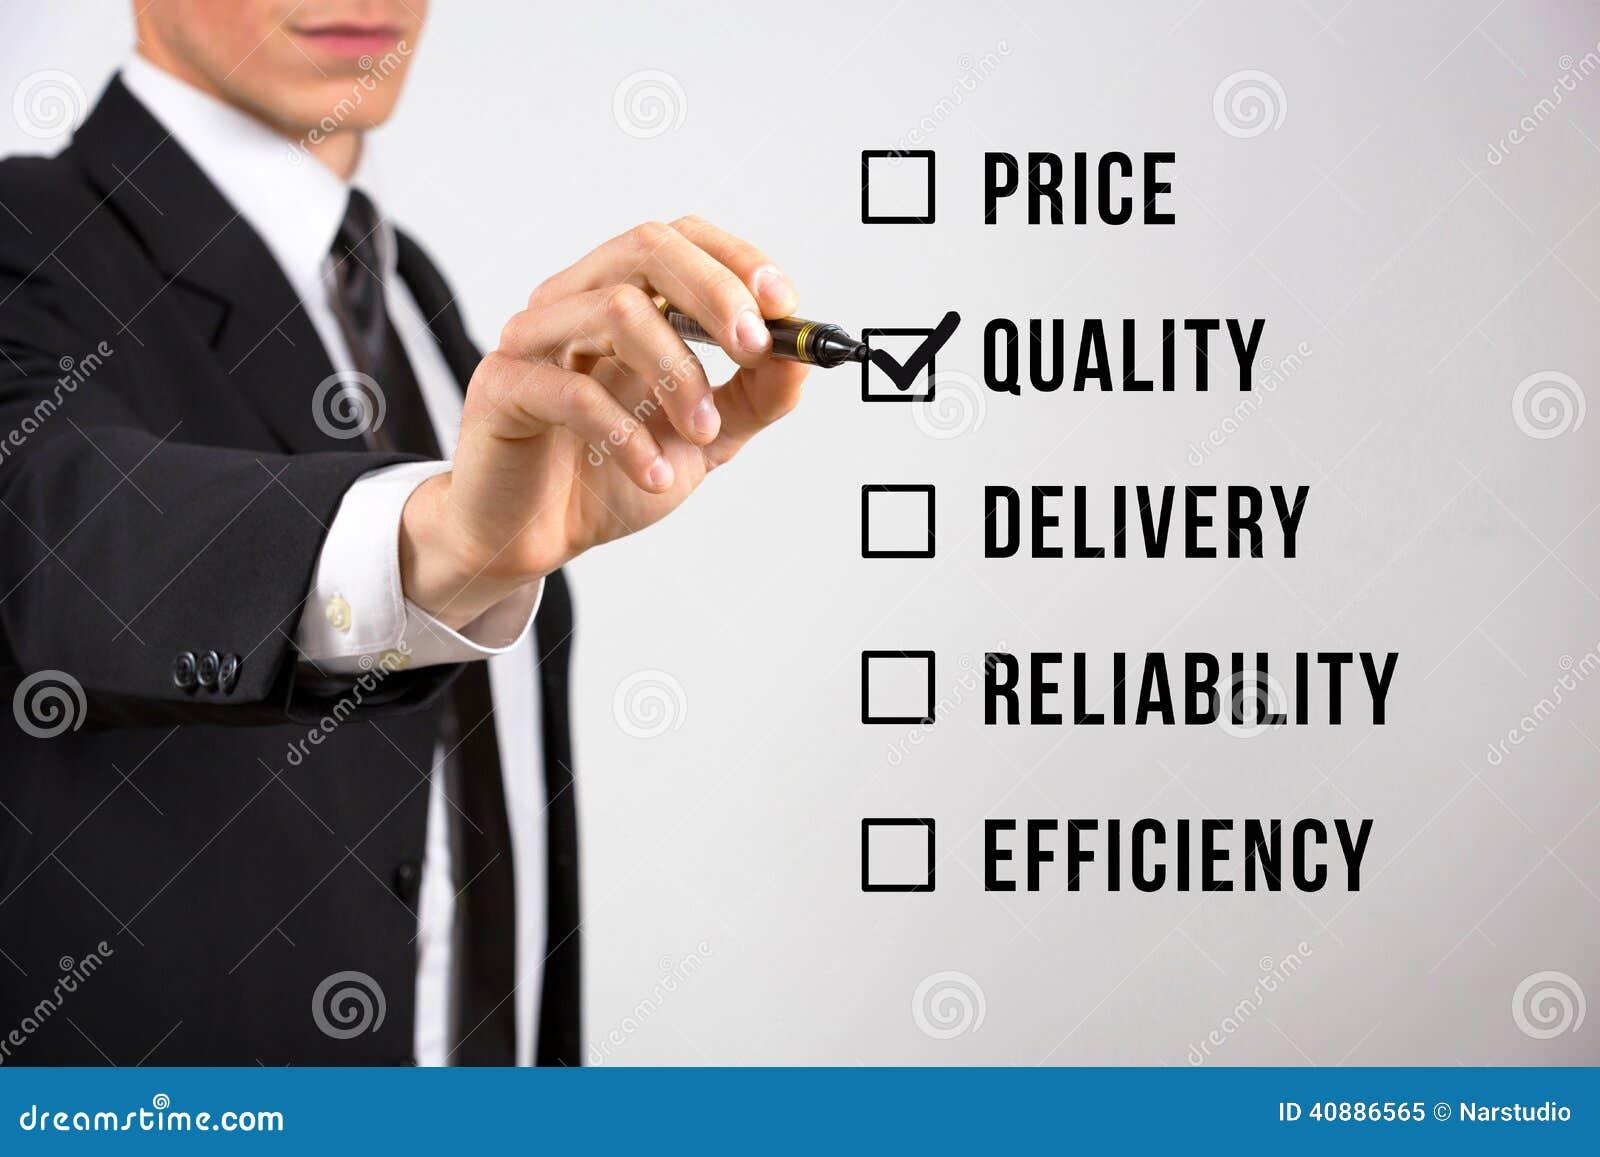 List of Business Keywords: Find the Best Keywords For Your Business